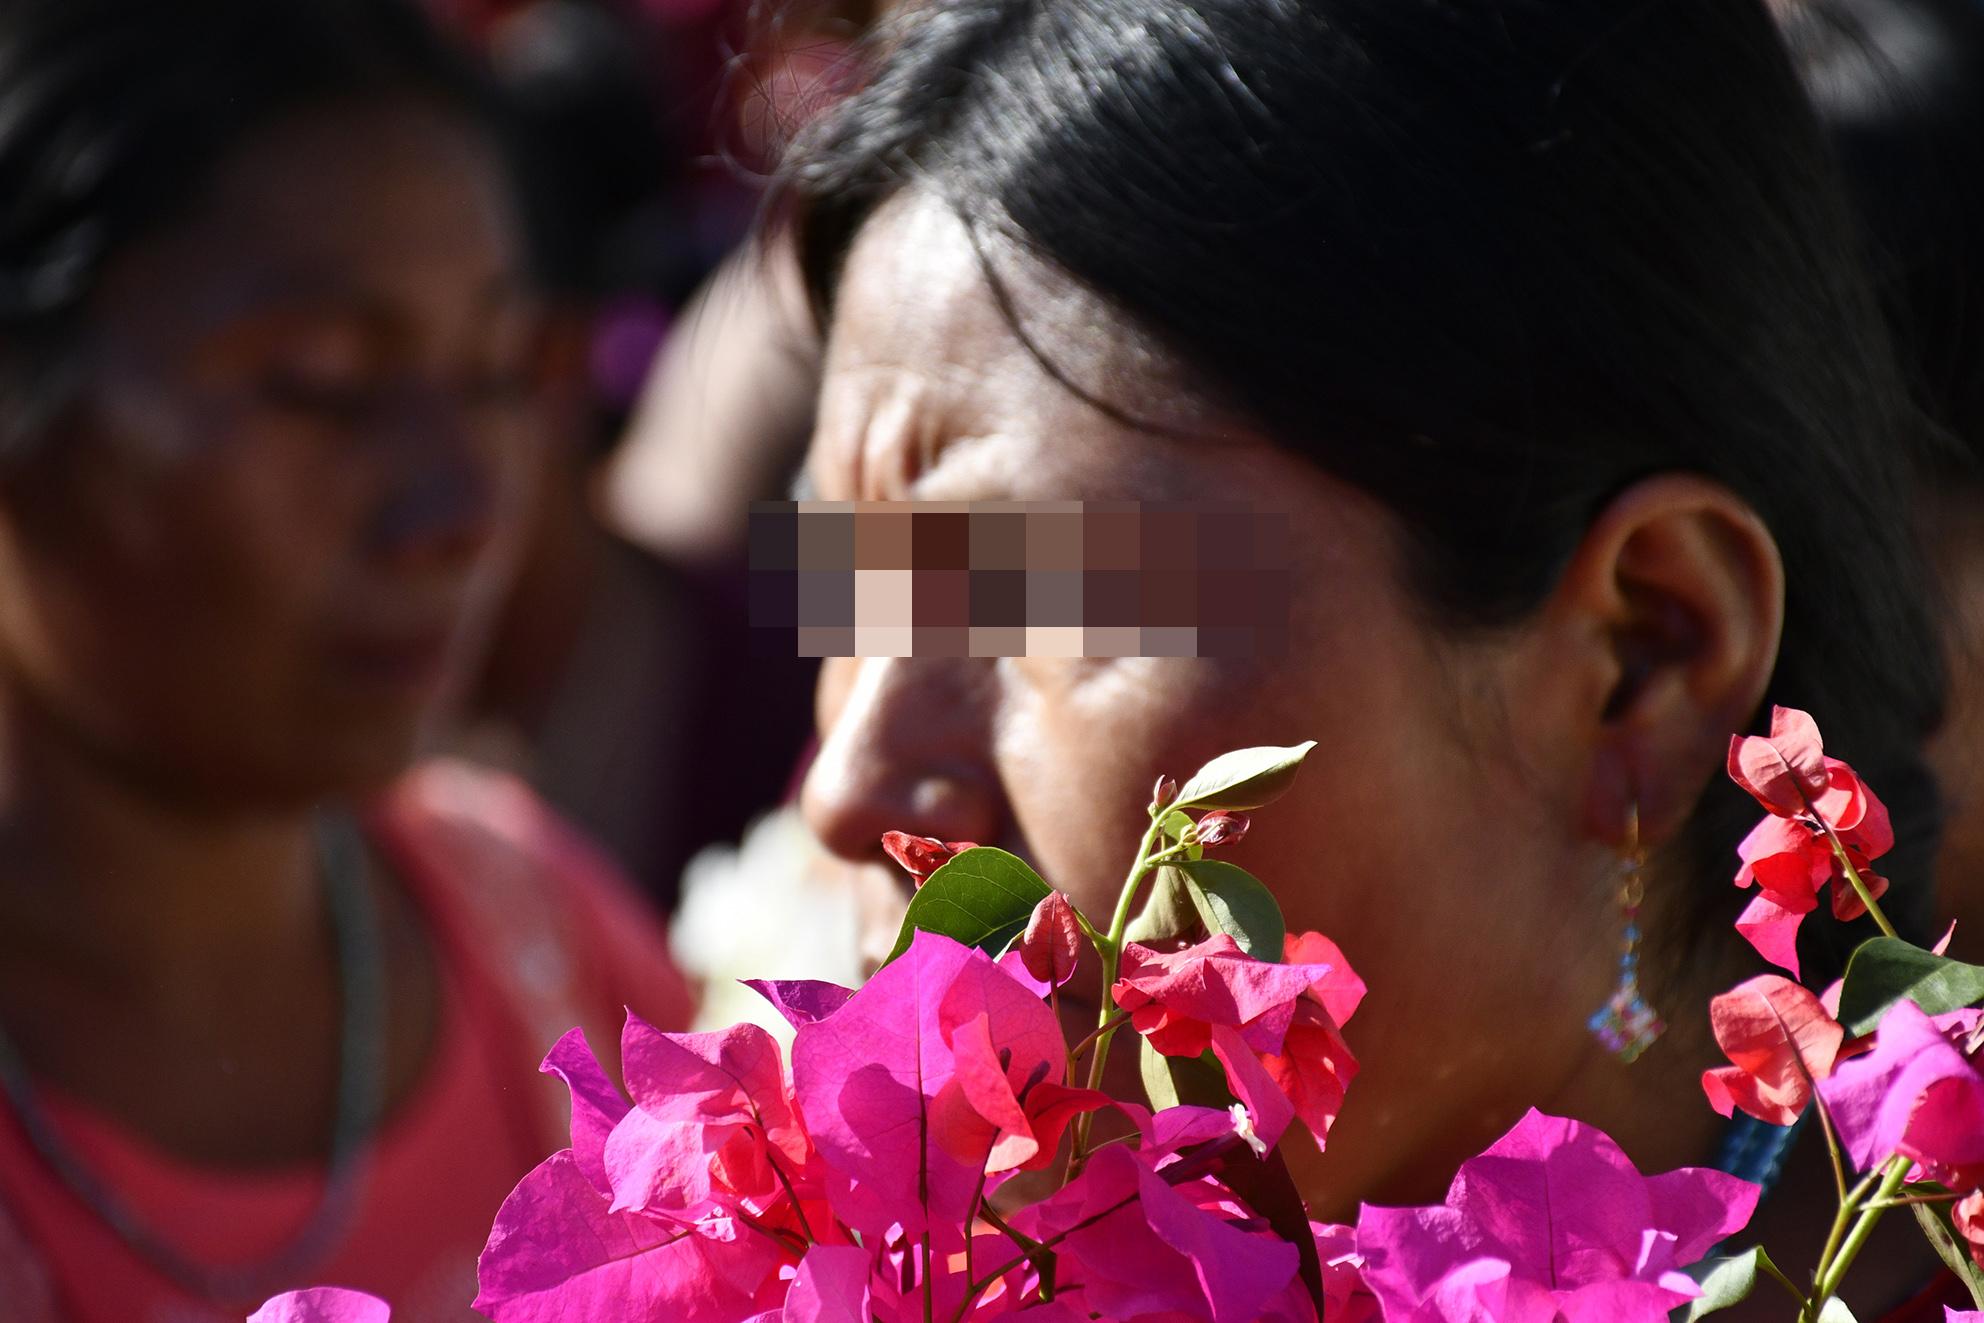 Mujeres sin voz en Oaxaca: obedecer sin cuestionar